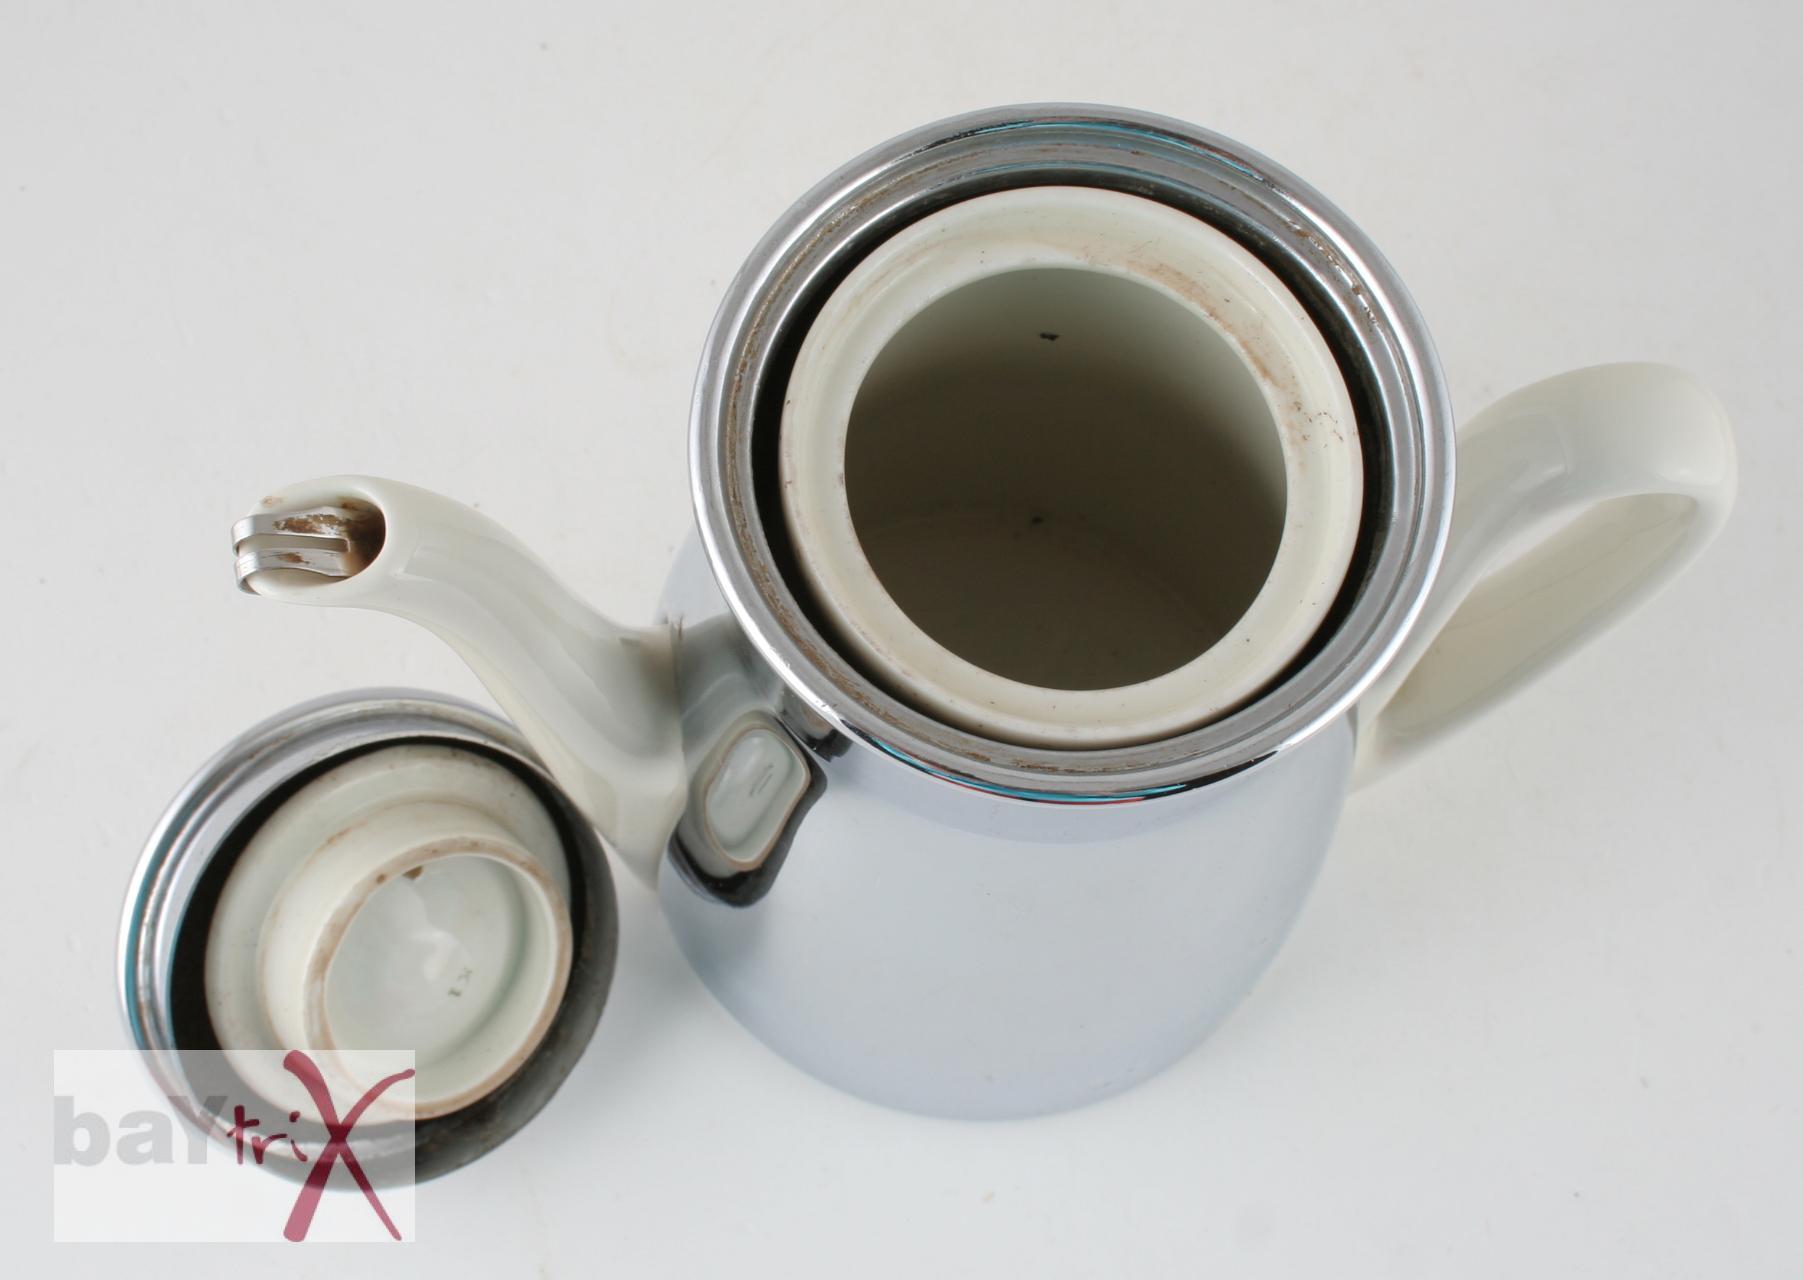 kaffeekanne f rstenberg thermo porzellan kanne thermohaube. Black Bedroom Furniture Sets. Home Design Ideas